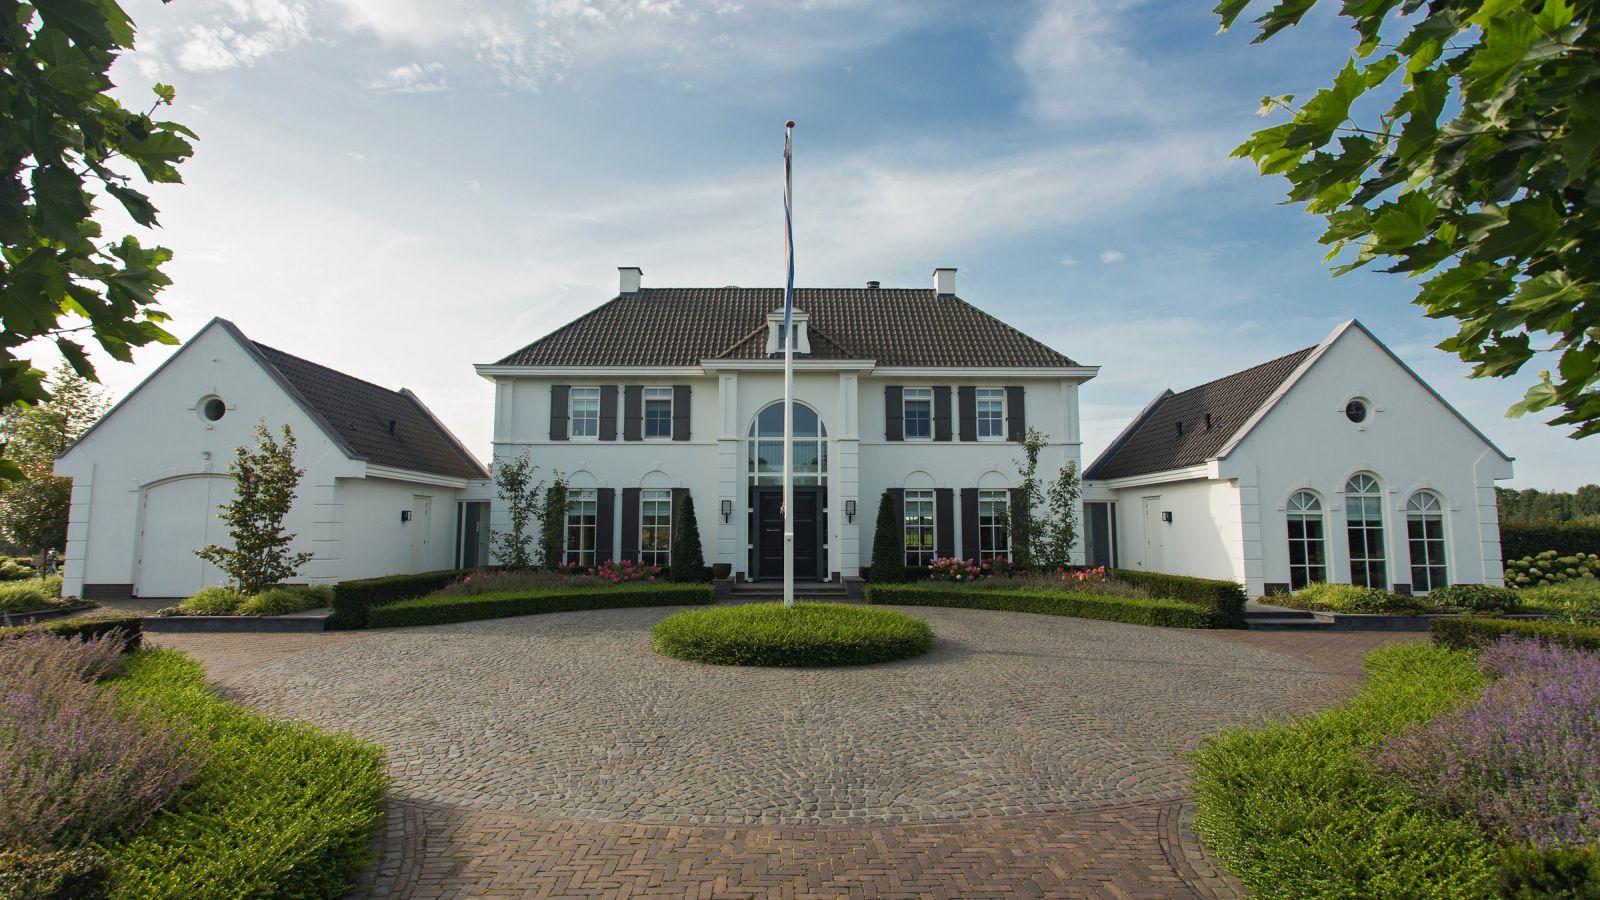 2.4 Großzügige Poolanlage in Villengarten in Doetinchem (NL)